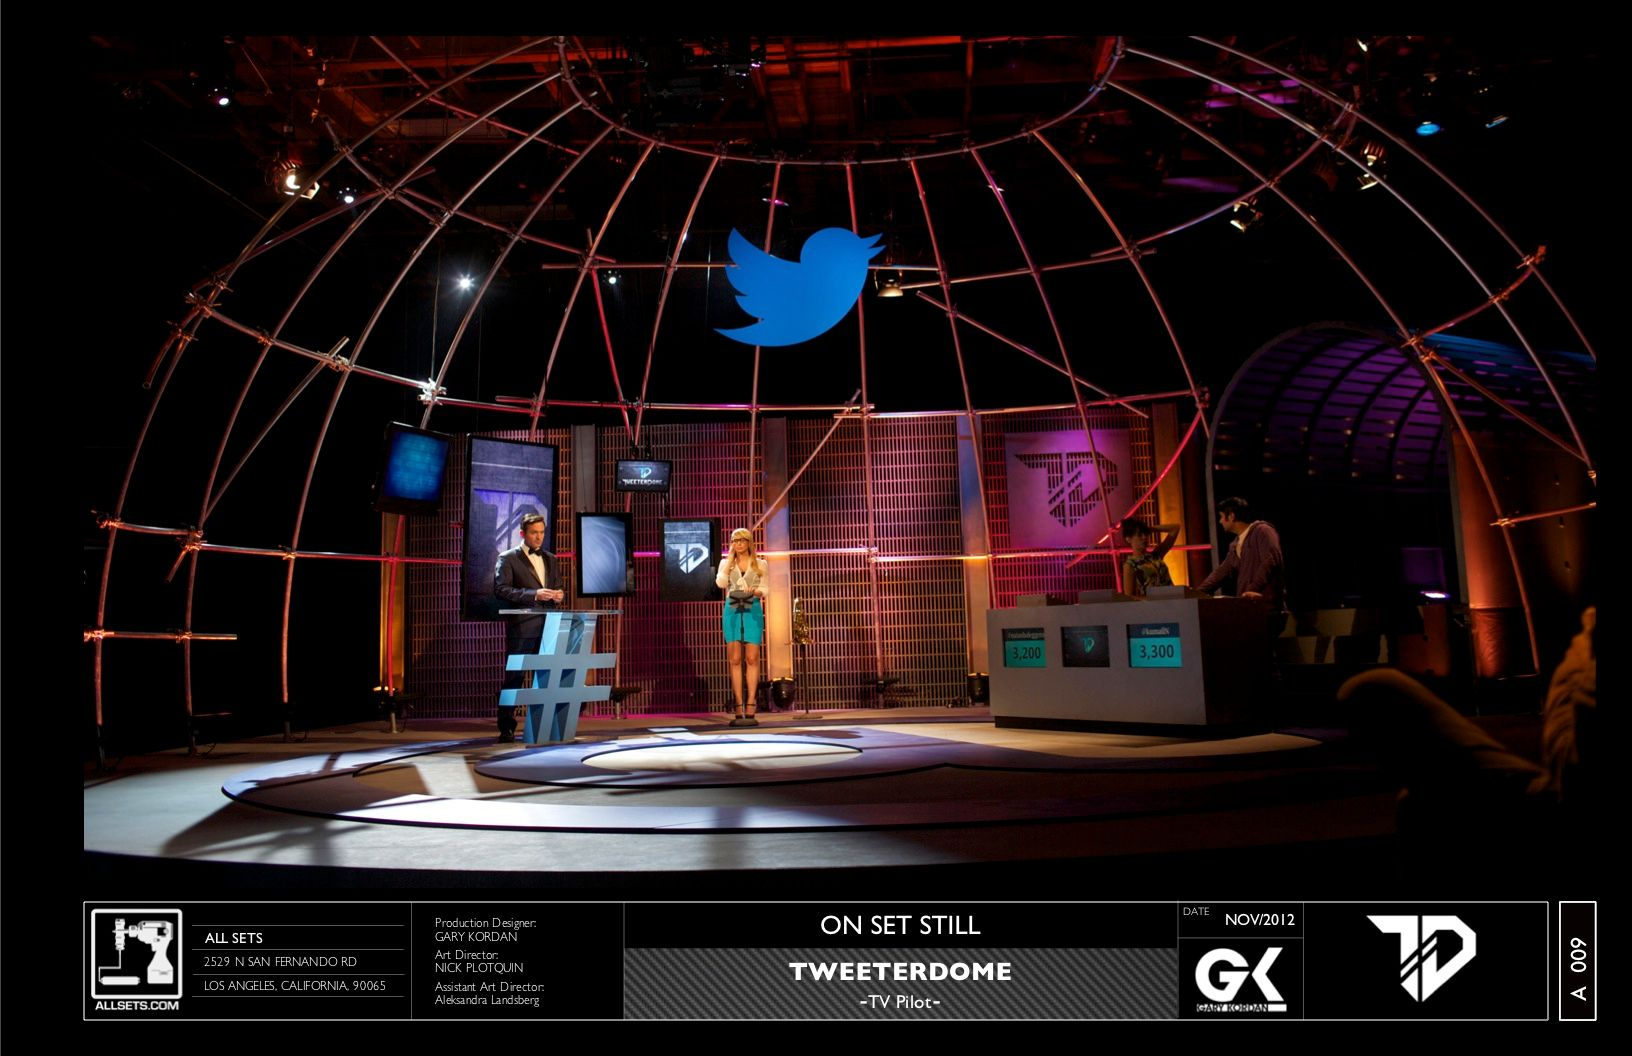 tweetdome_11.7_web_9.jpg